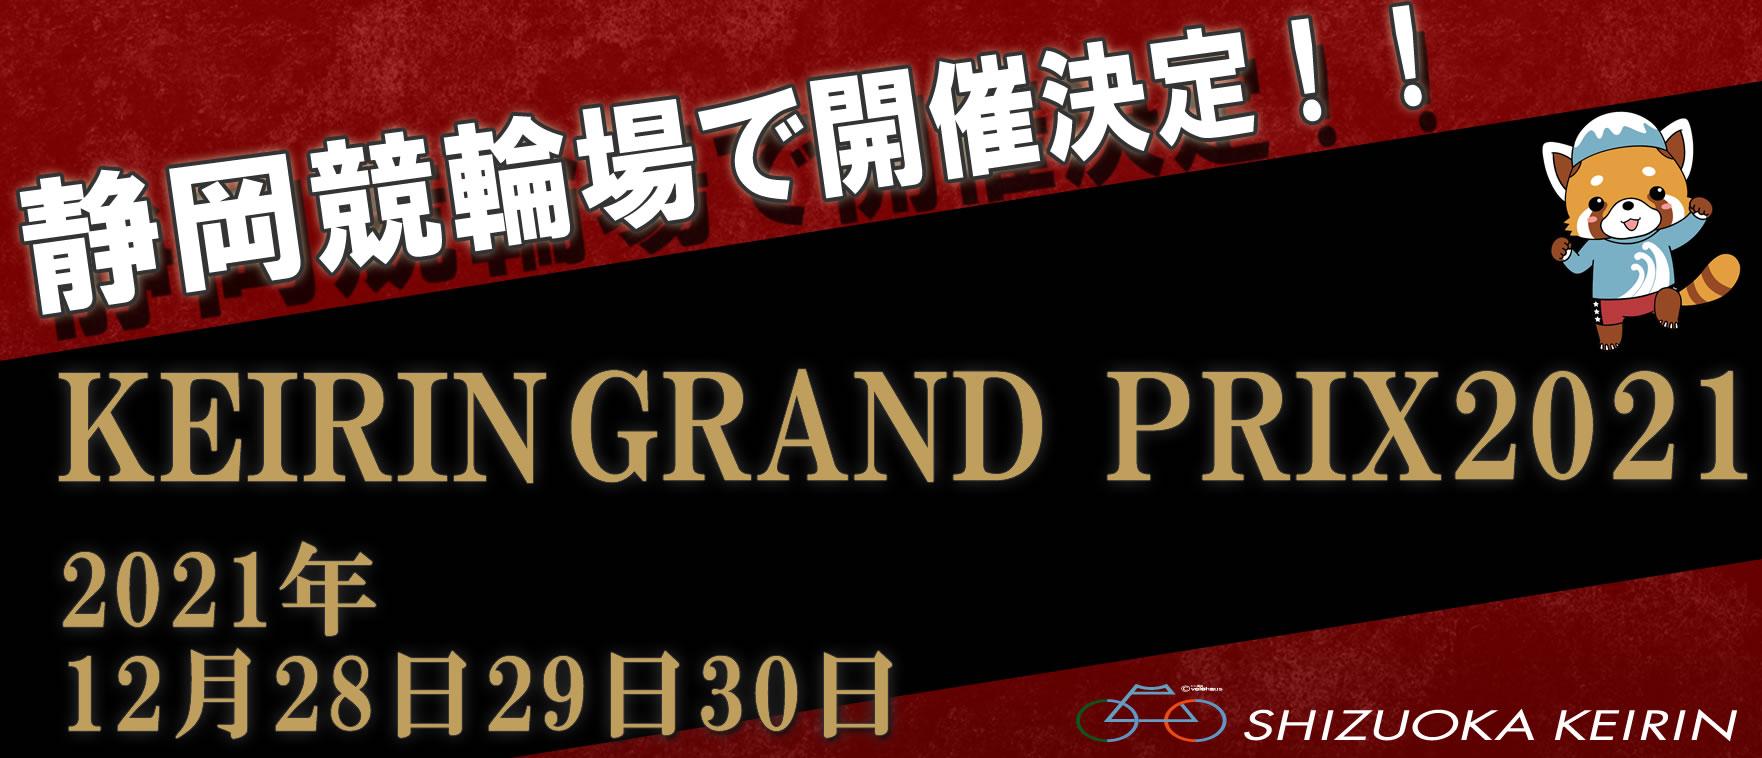 KEIRINGP2021 開催決定!